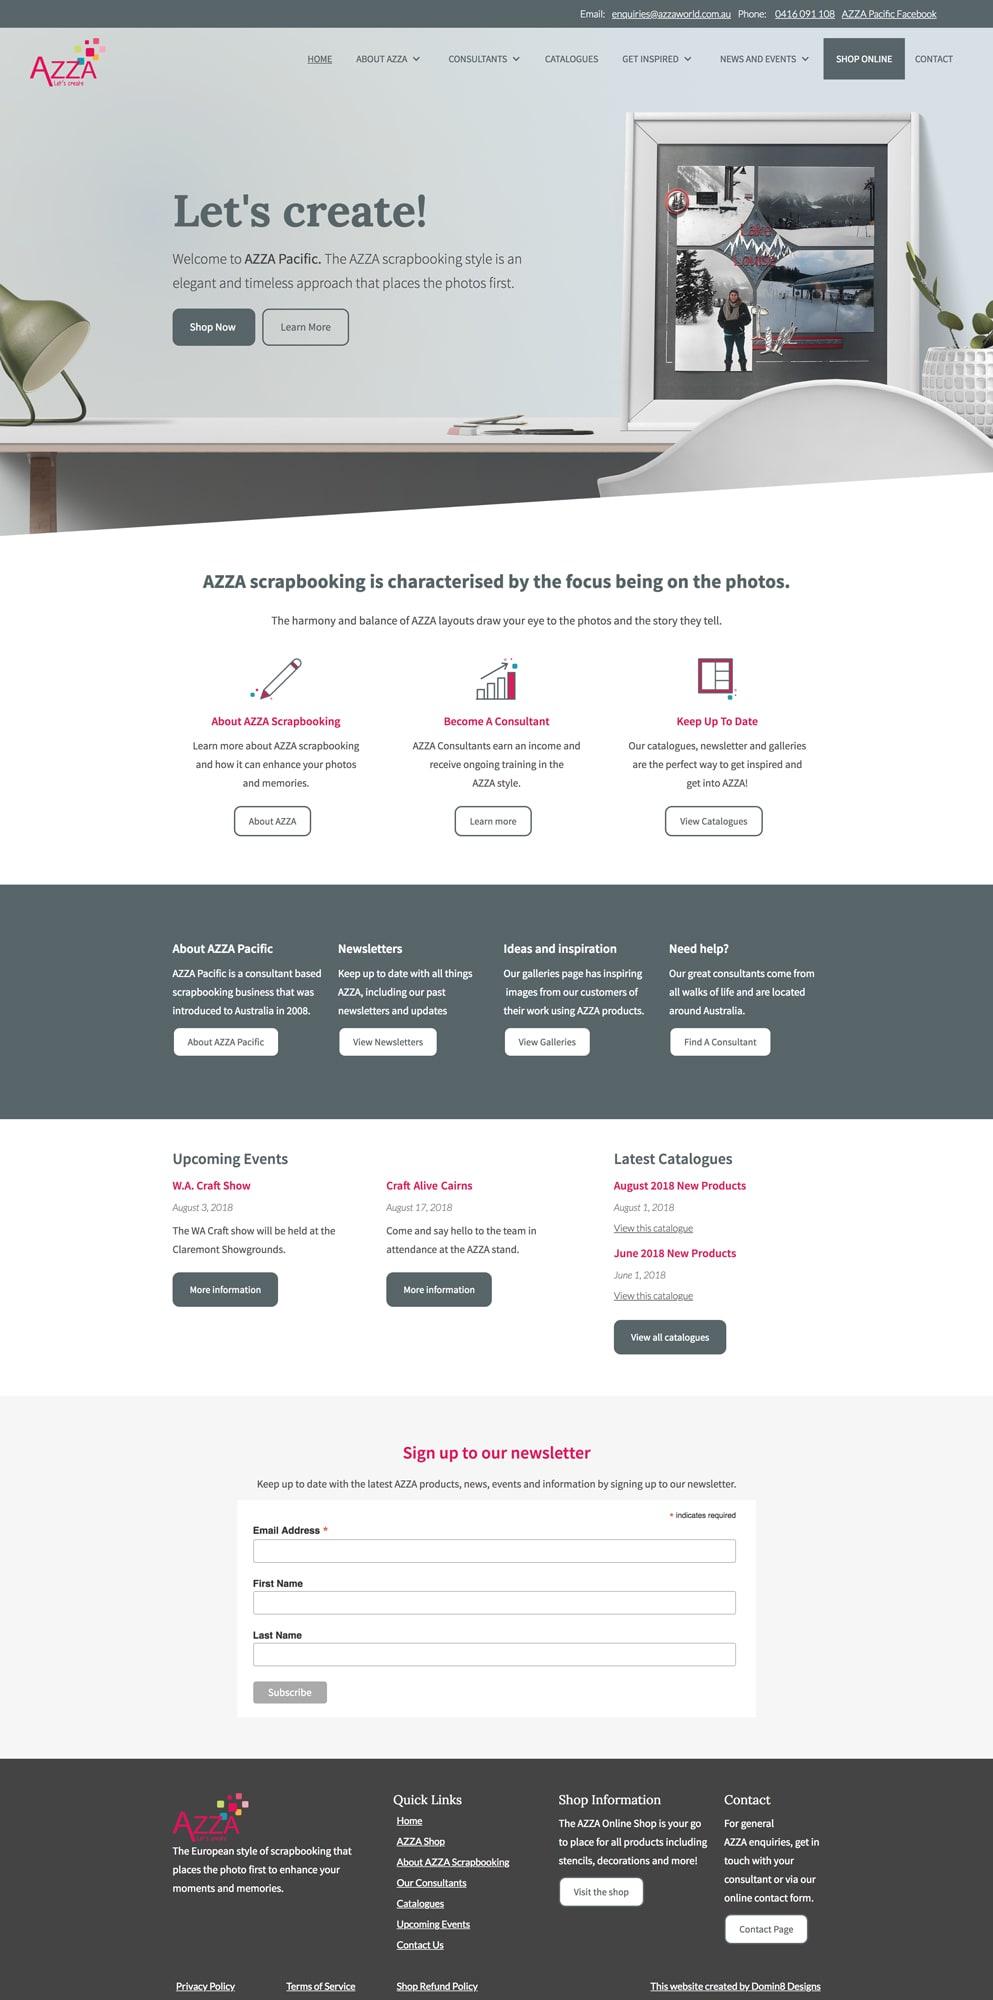 Full layout of the AZZA website